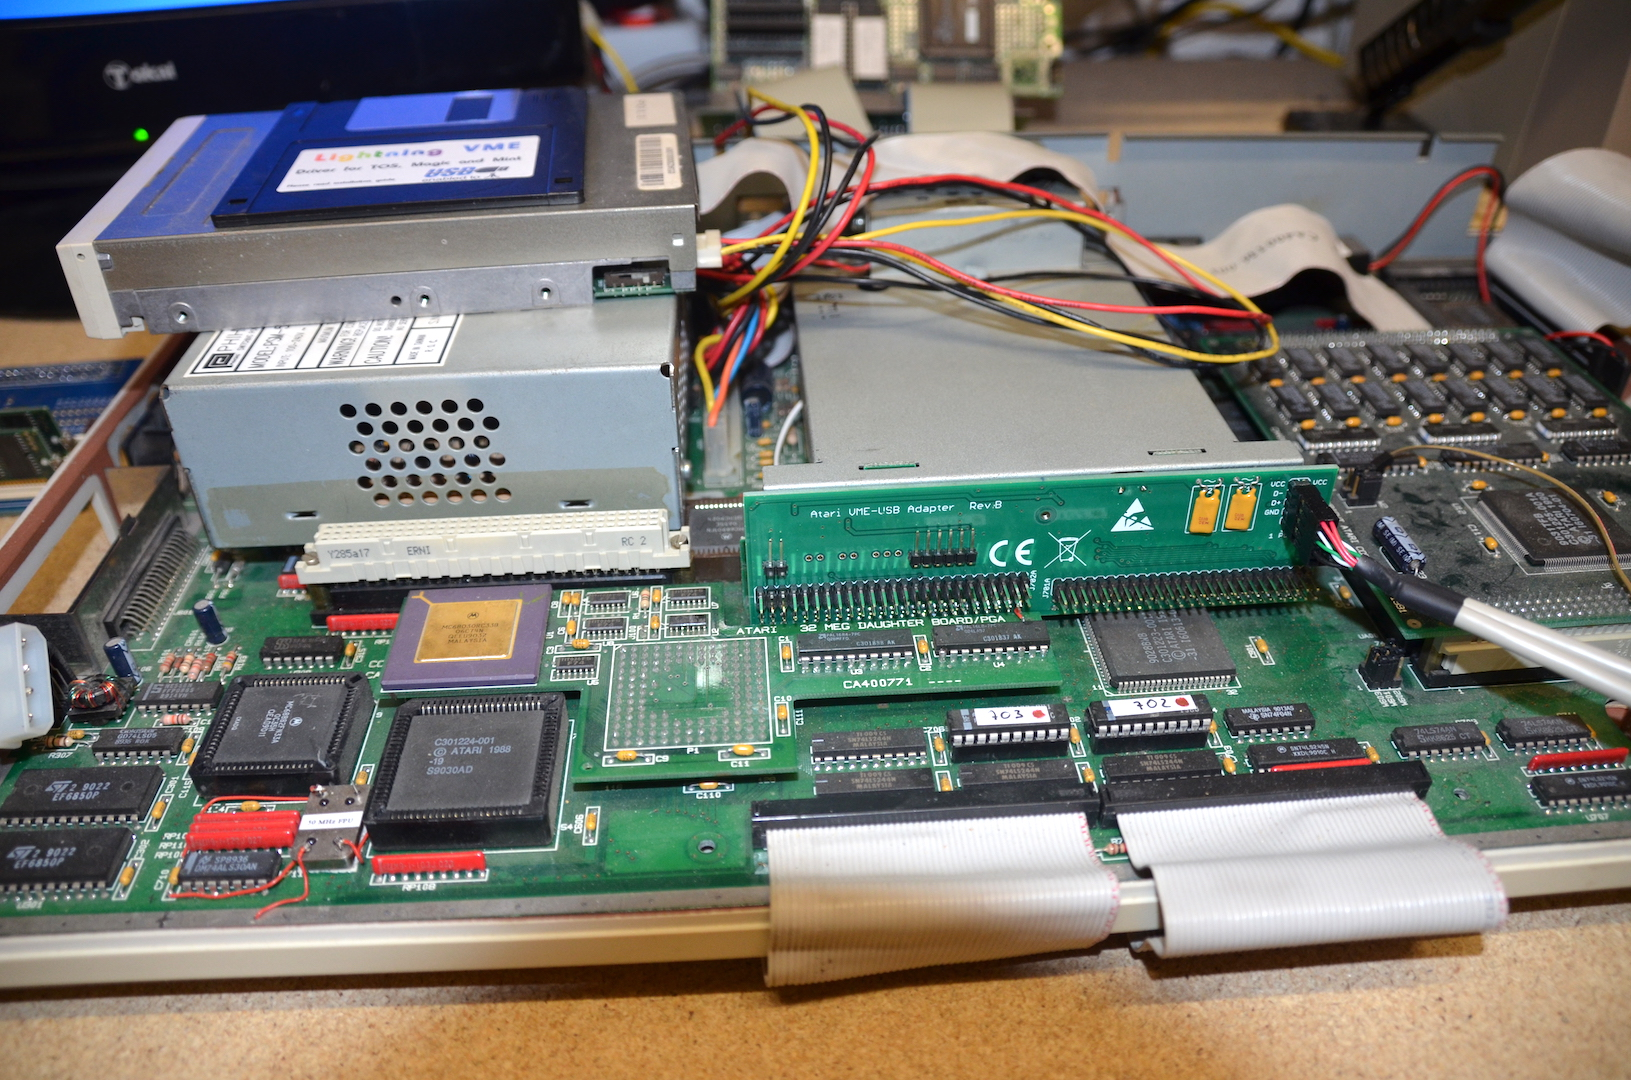 Stupendous Datei Lightning Daughterboard1 Atari Wiki Wiring 101 Capemaxxcnl